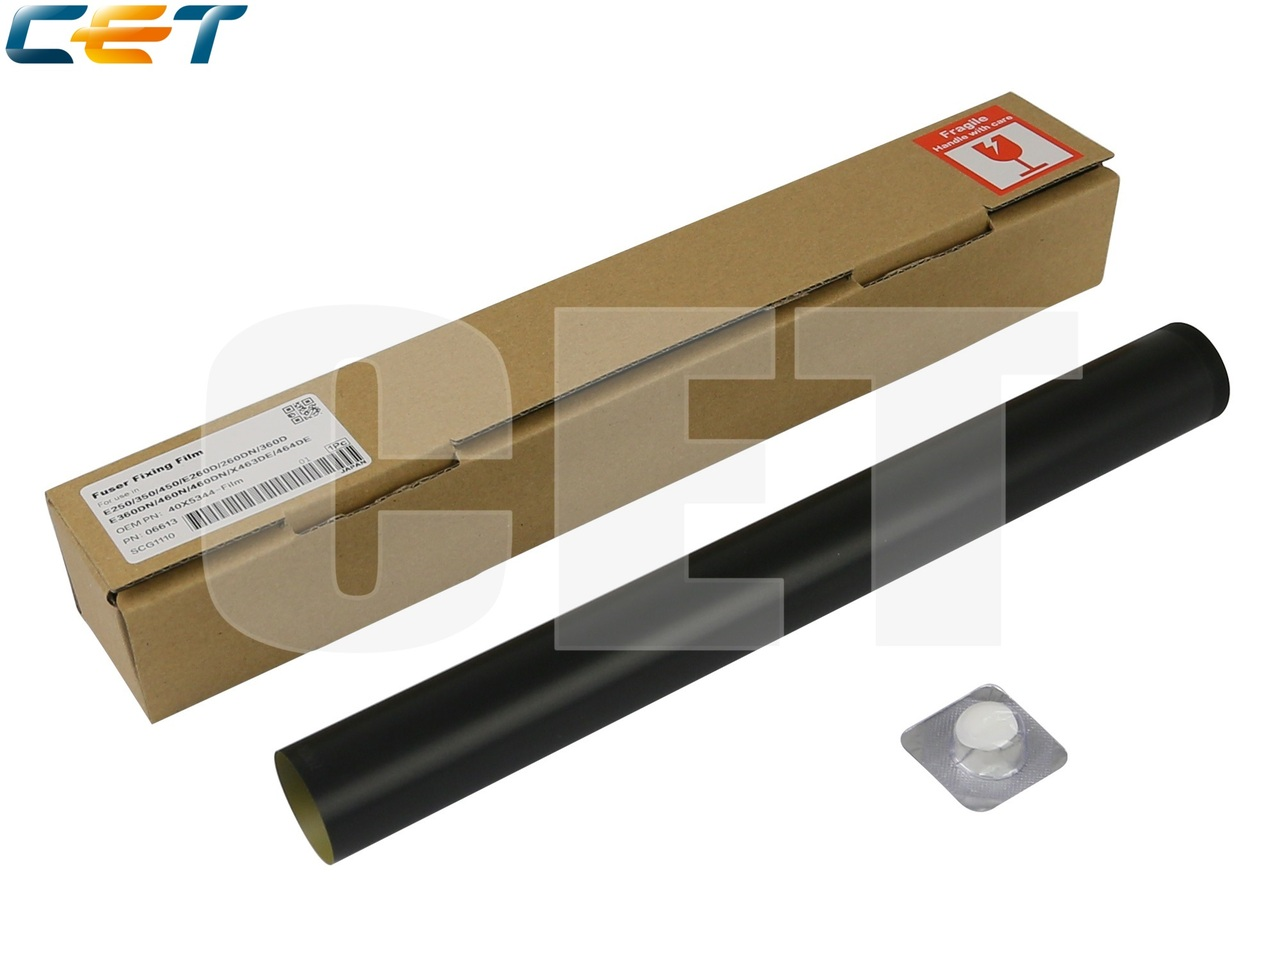 Термопленка 40X5344 для LEXMARKE250/350/450/260DN/360DN/460DN/X463DE/464DE X466DE(CET), CET6613